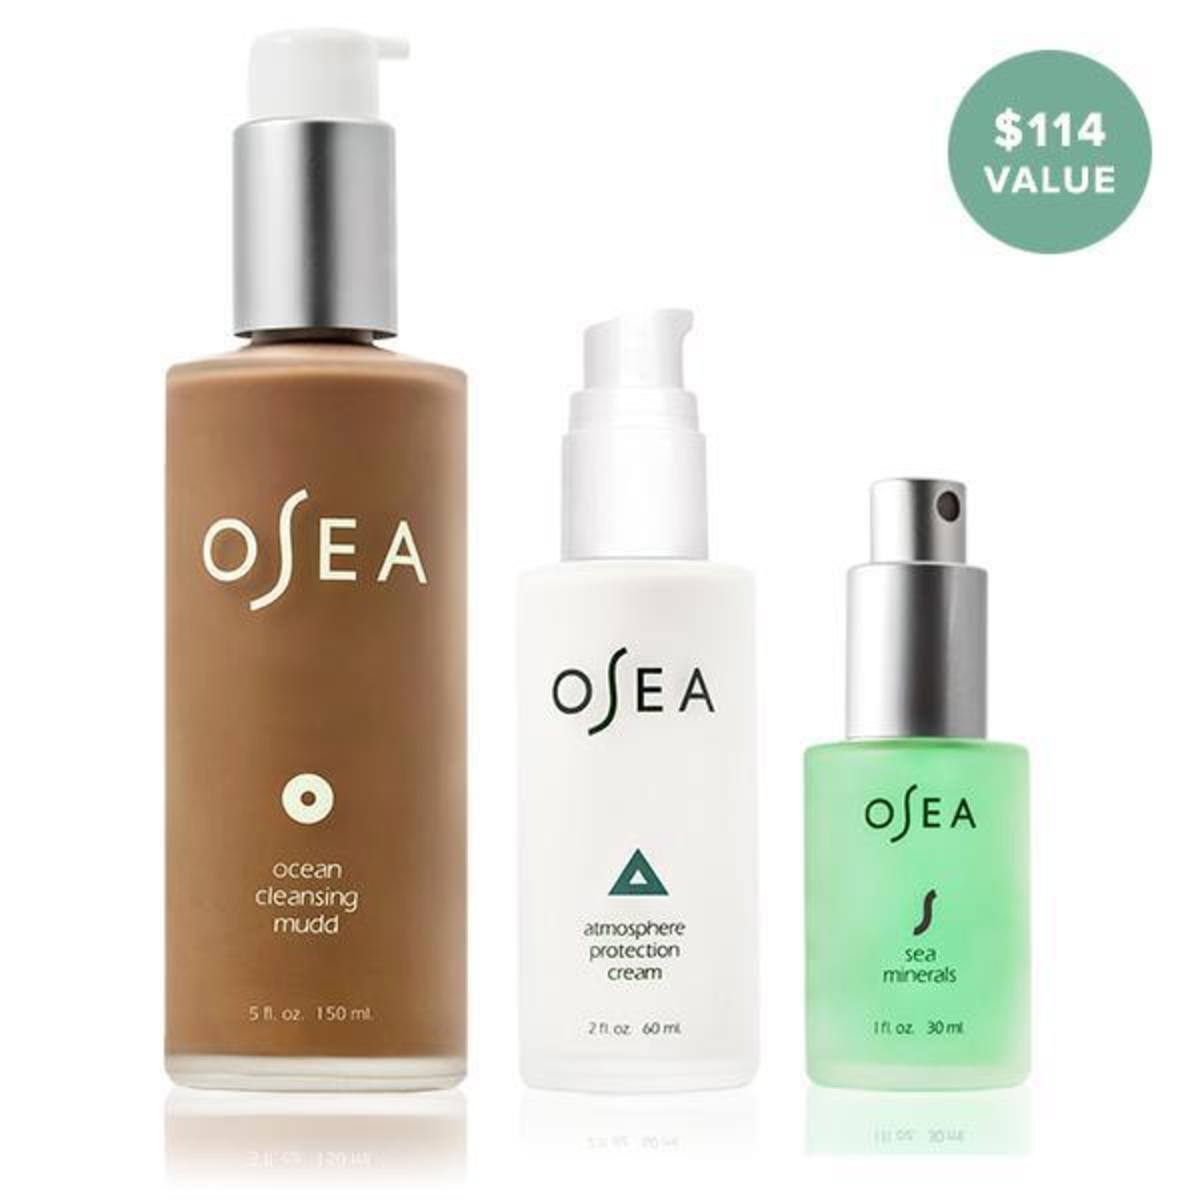 OSEA-him-set-full-r_d68d3216-89aa-4505-b56c-aae254d207c6